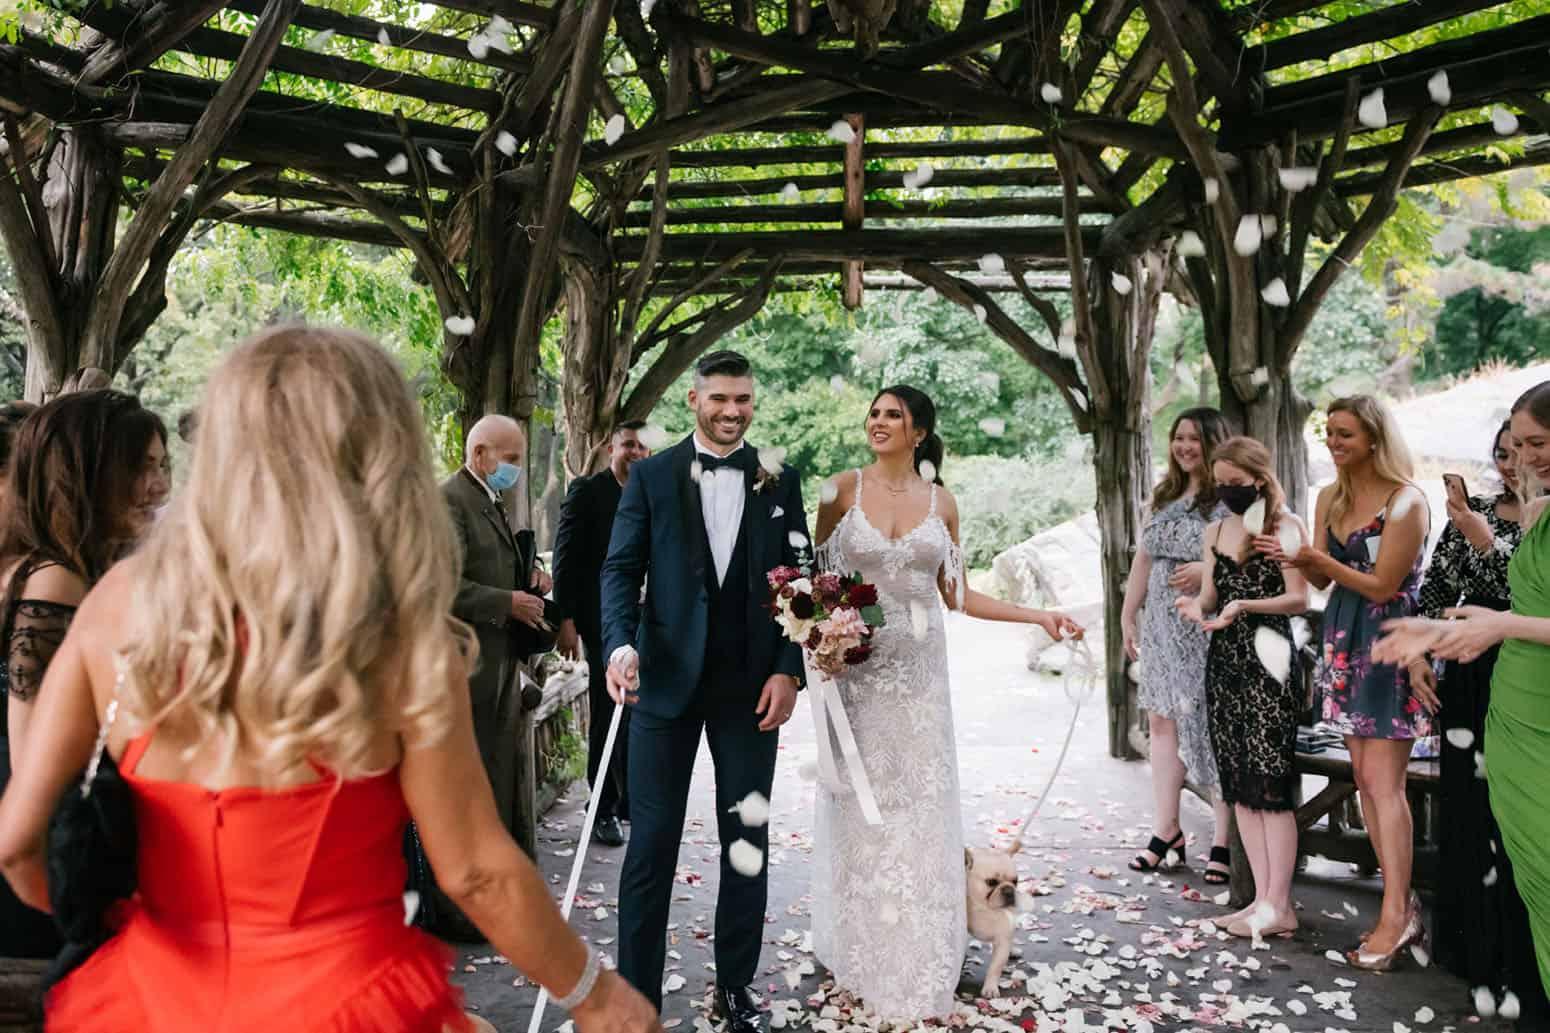 Dene Summerhouse wedding, a treehouse for dreaming wedding